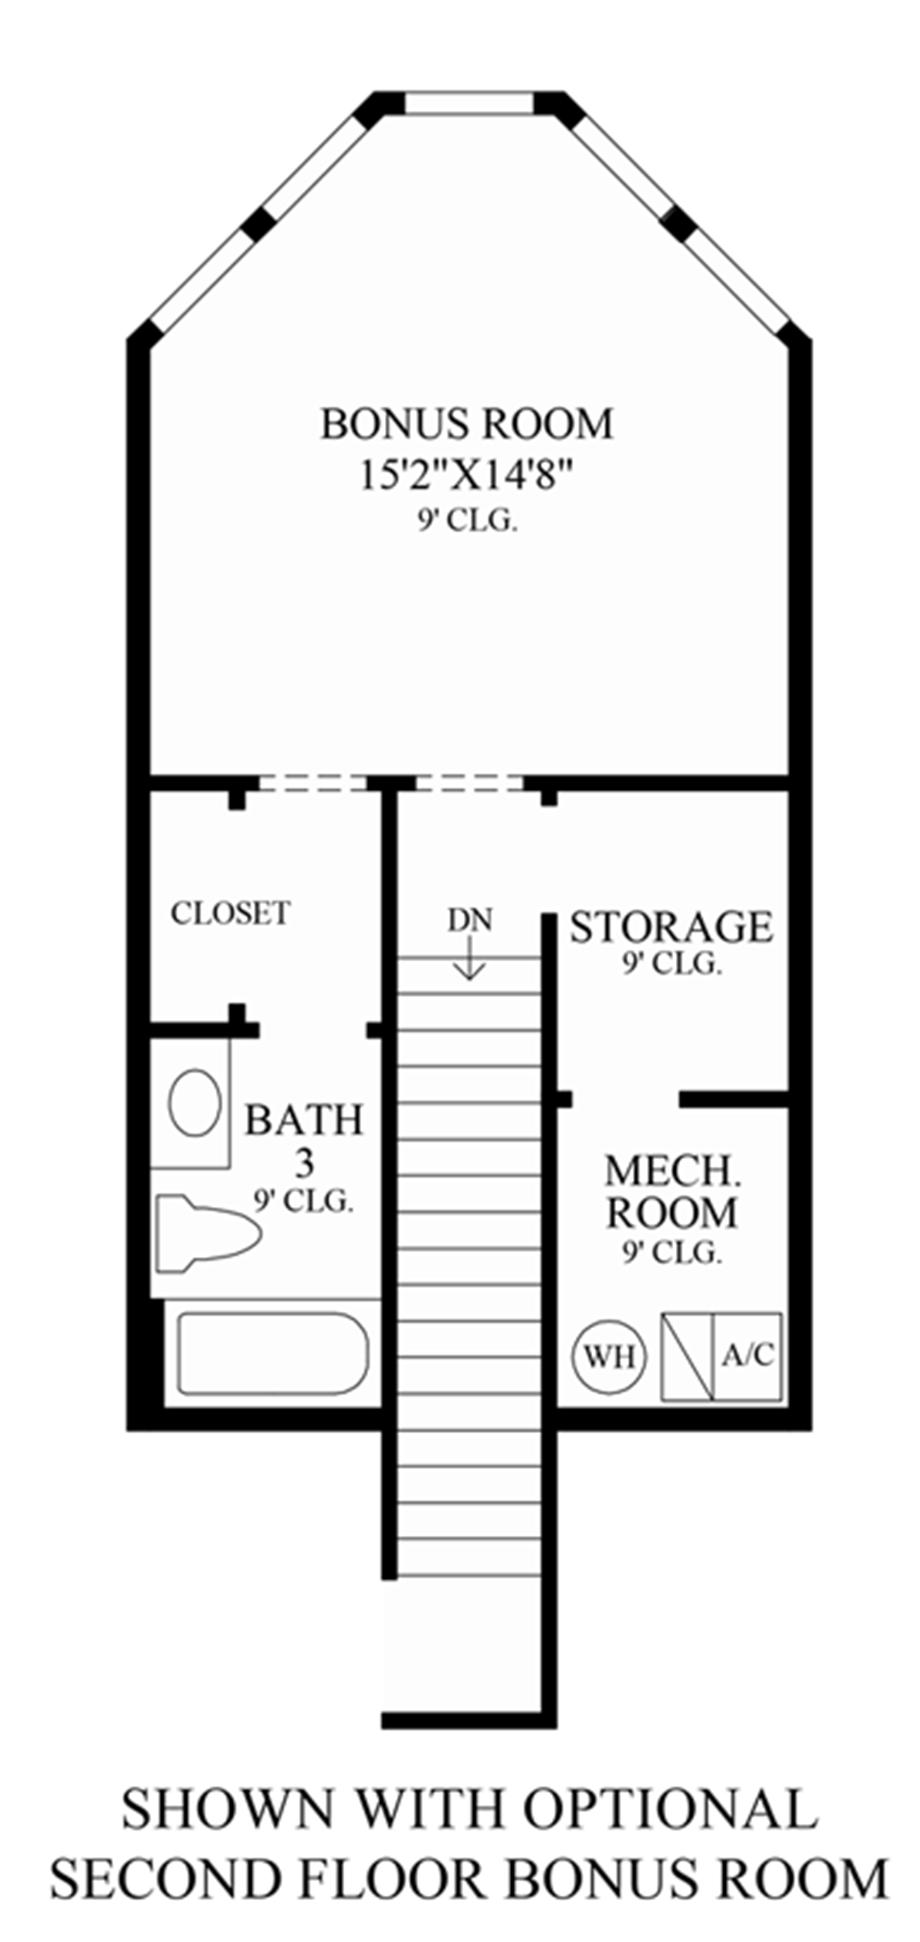 Optional 2nd Floor Bonus Room Floor Plan